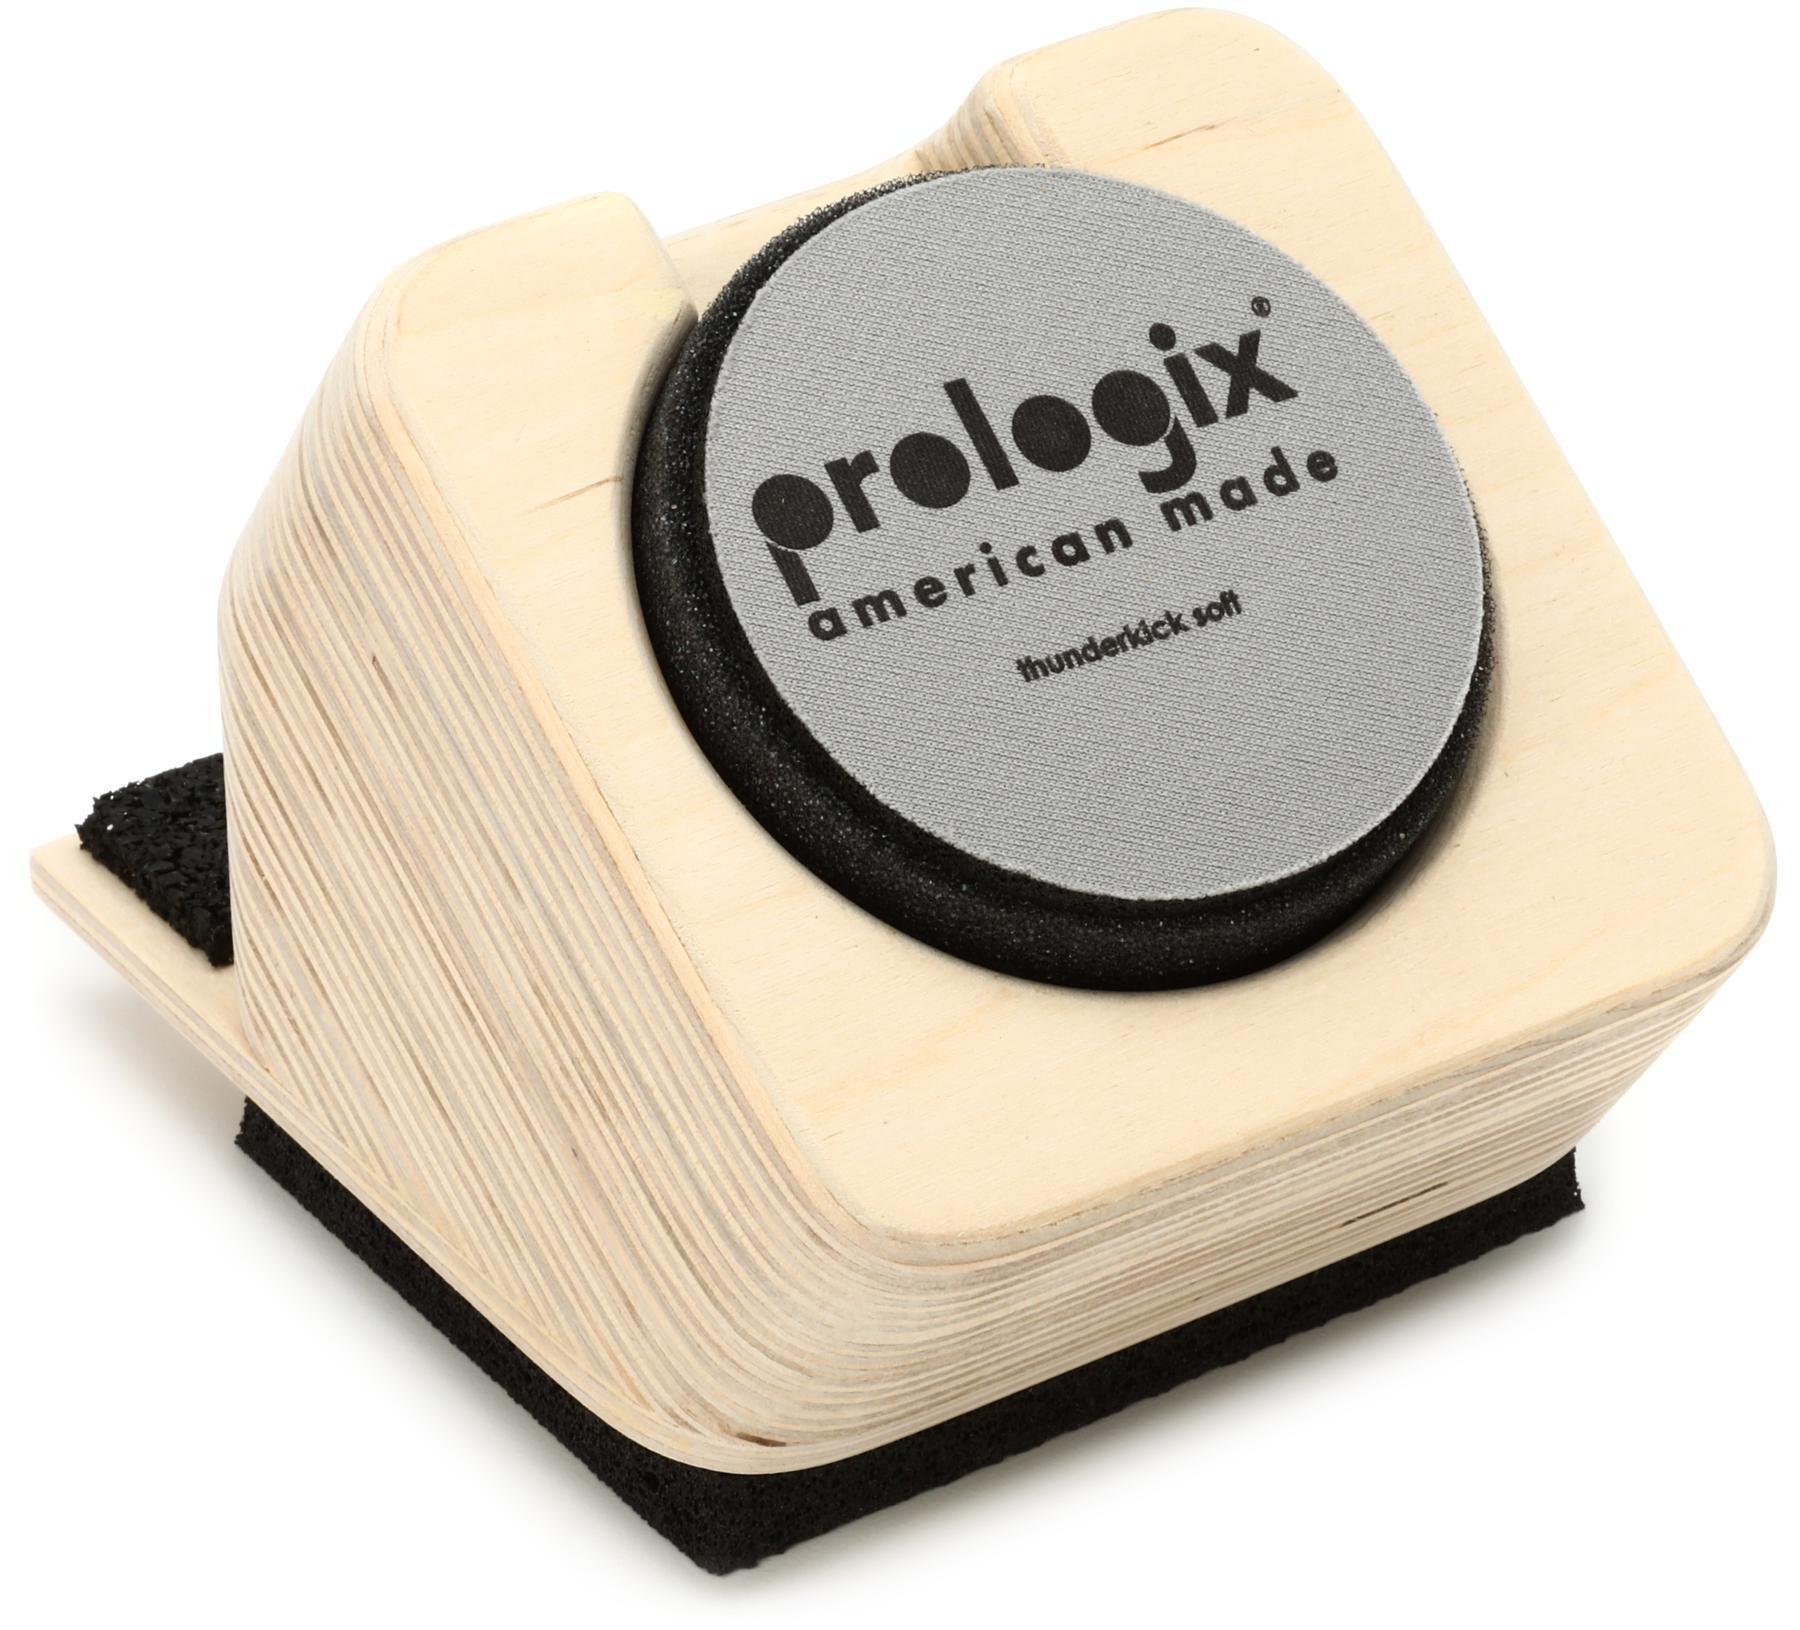 3. Prologix Thunderkick - Bass Drum Pedal Practice Pad